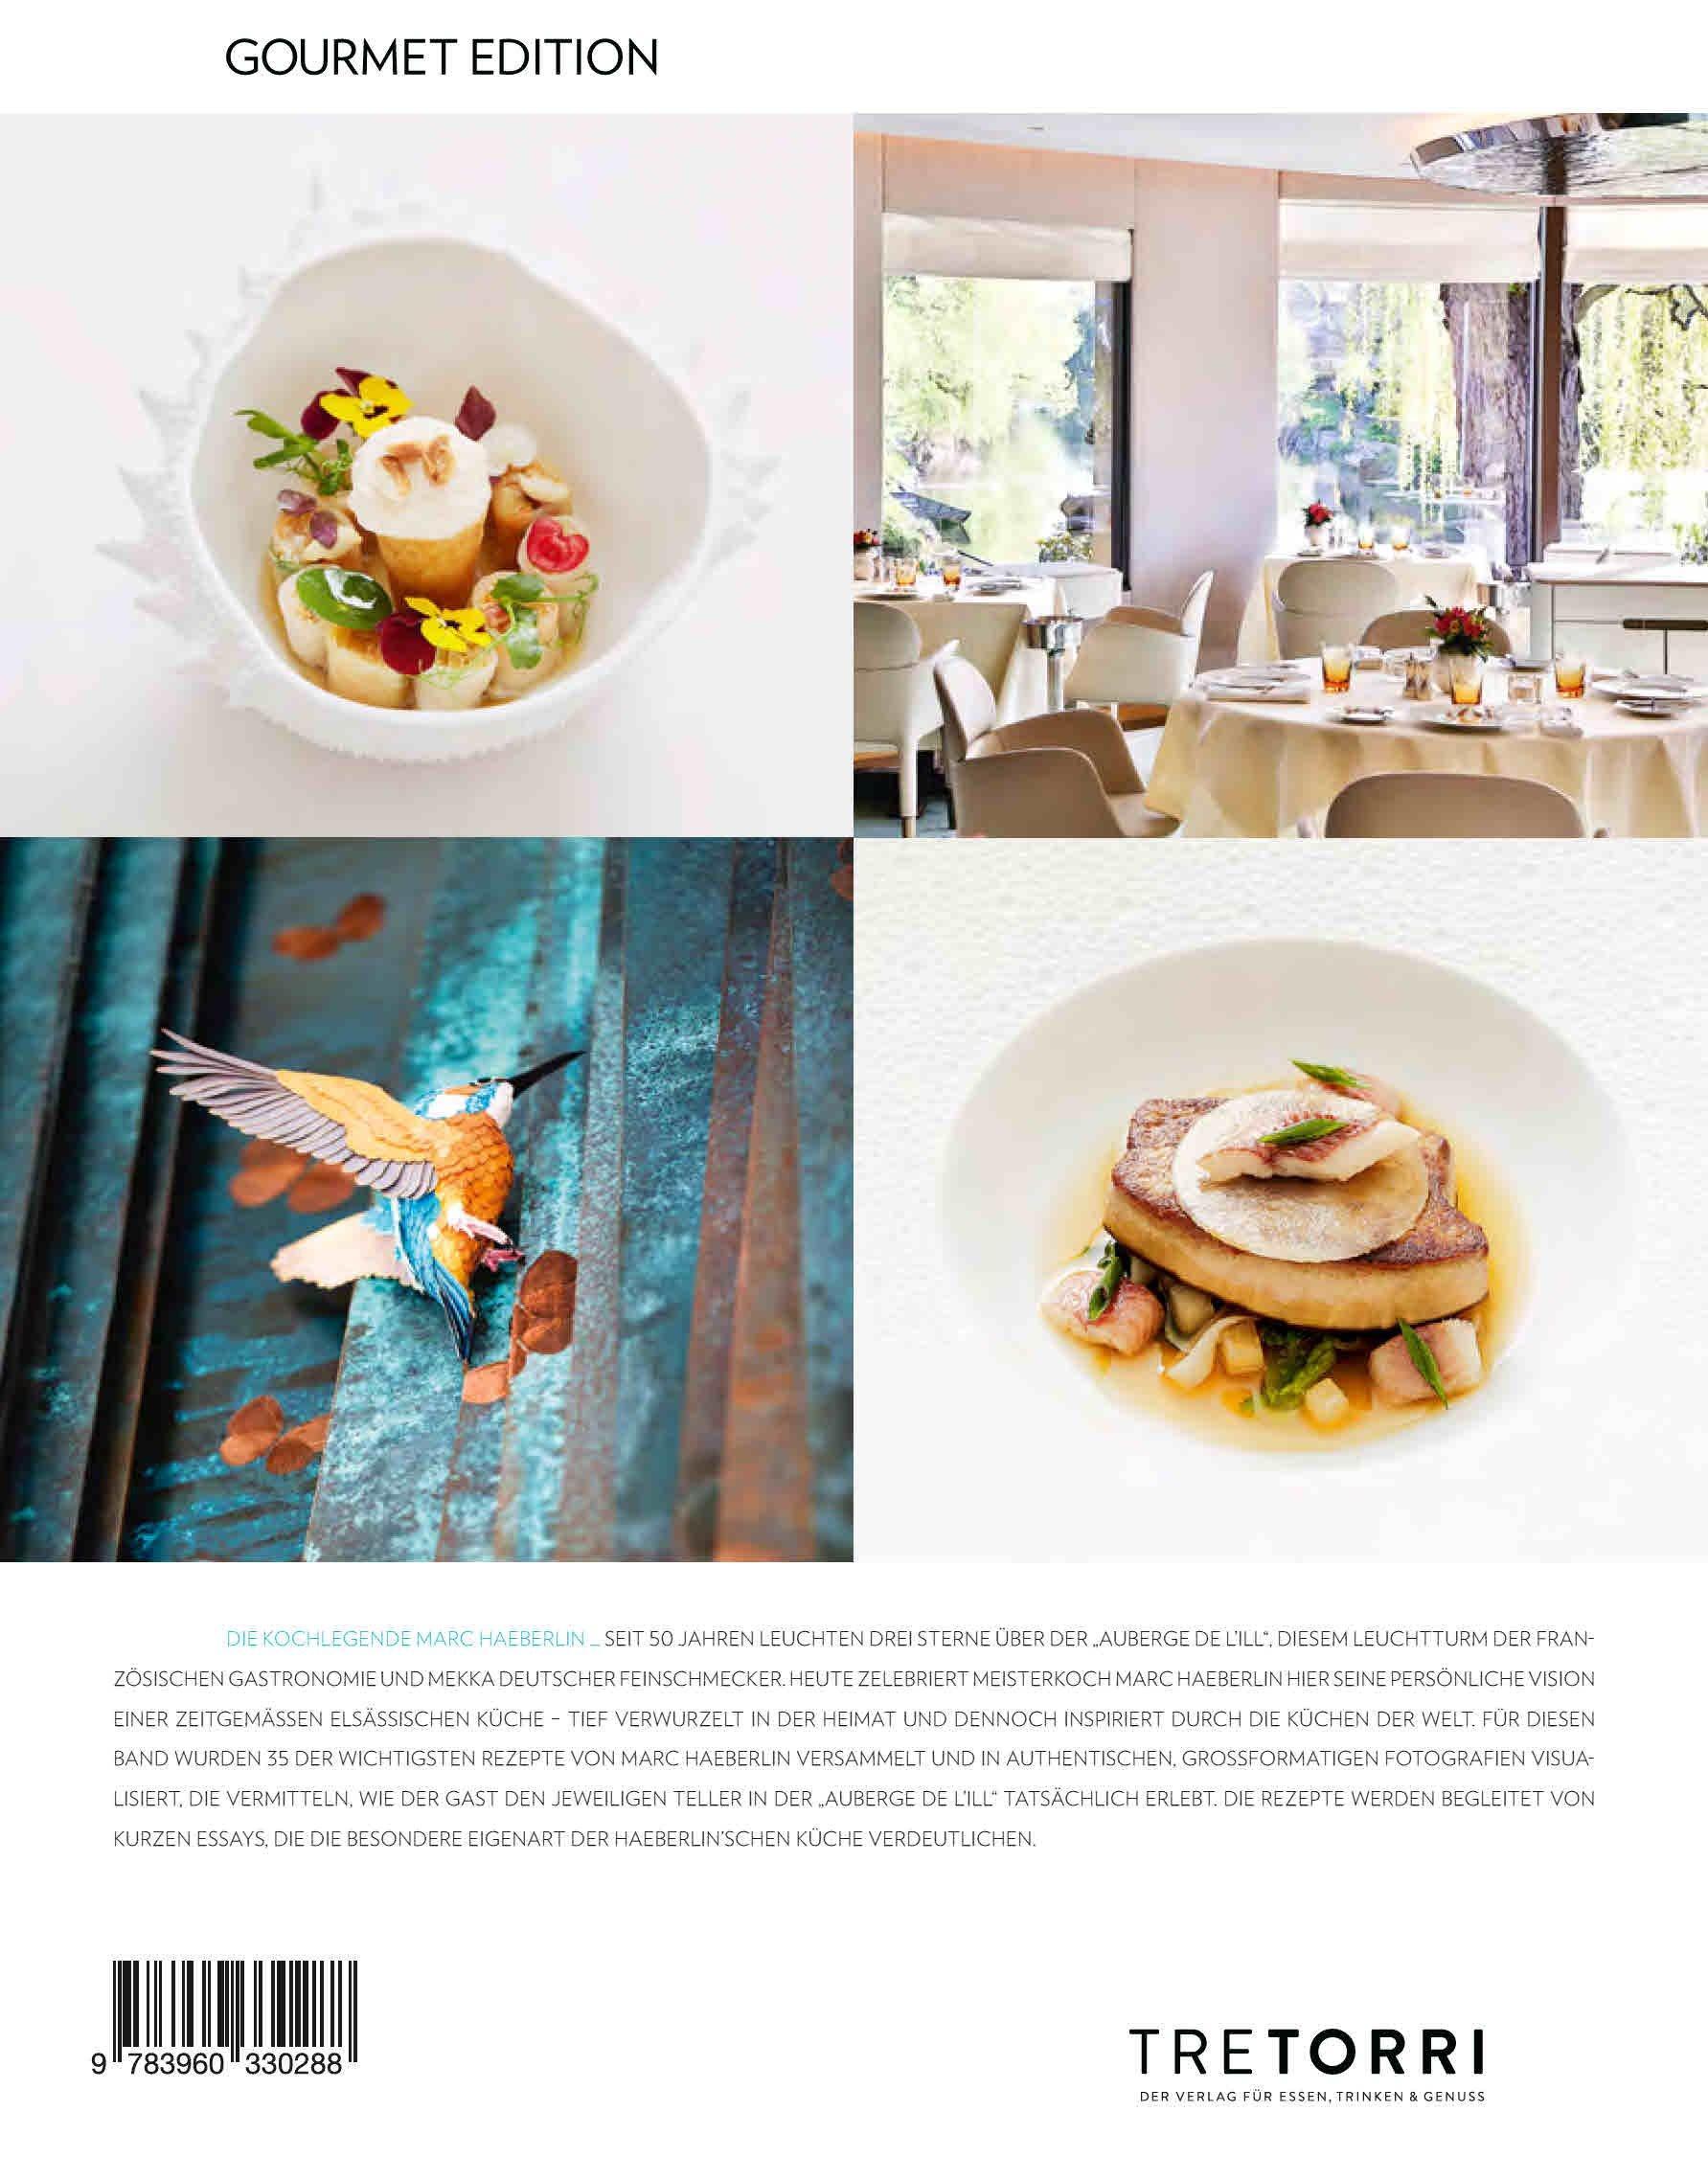 SZ Gourmet Edition: Die Kochlegende Marc Haeberlin: Marc Haeberlin ...